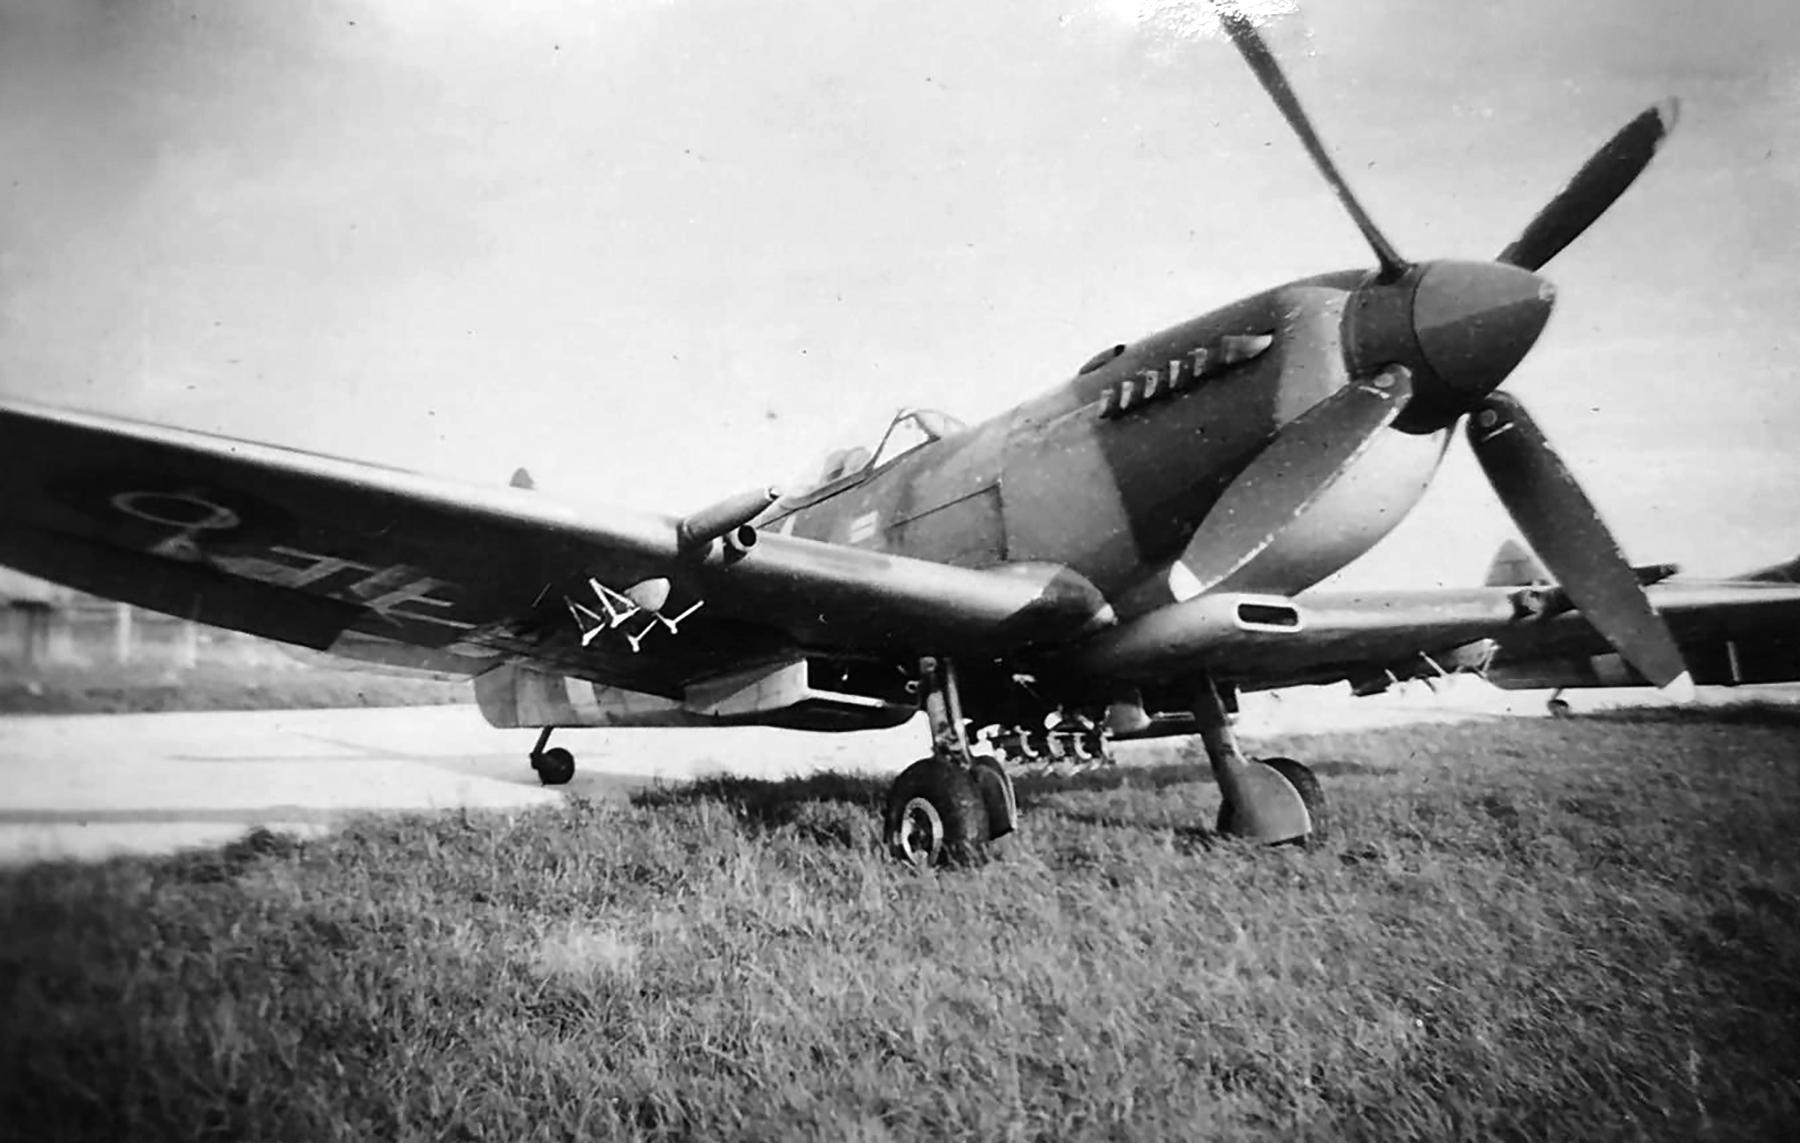 Spitfire MkIX RAF 164Sqn FJR with bomb rack mod web 01